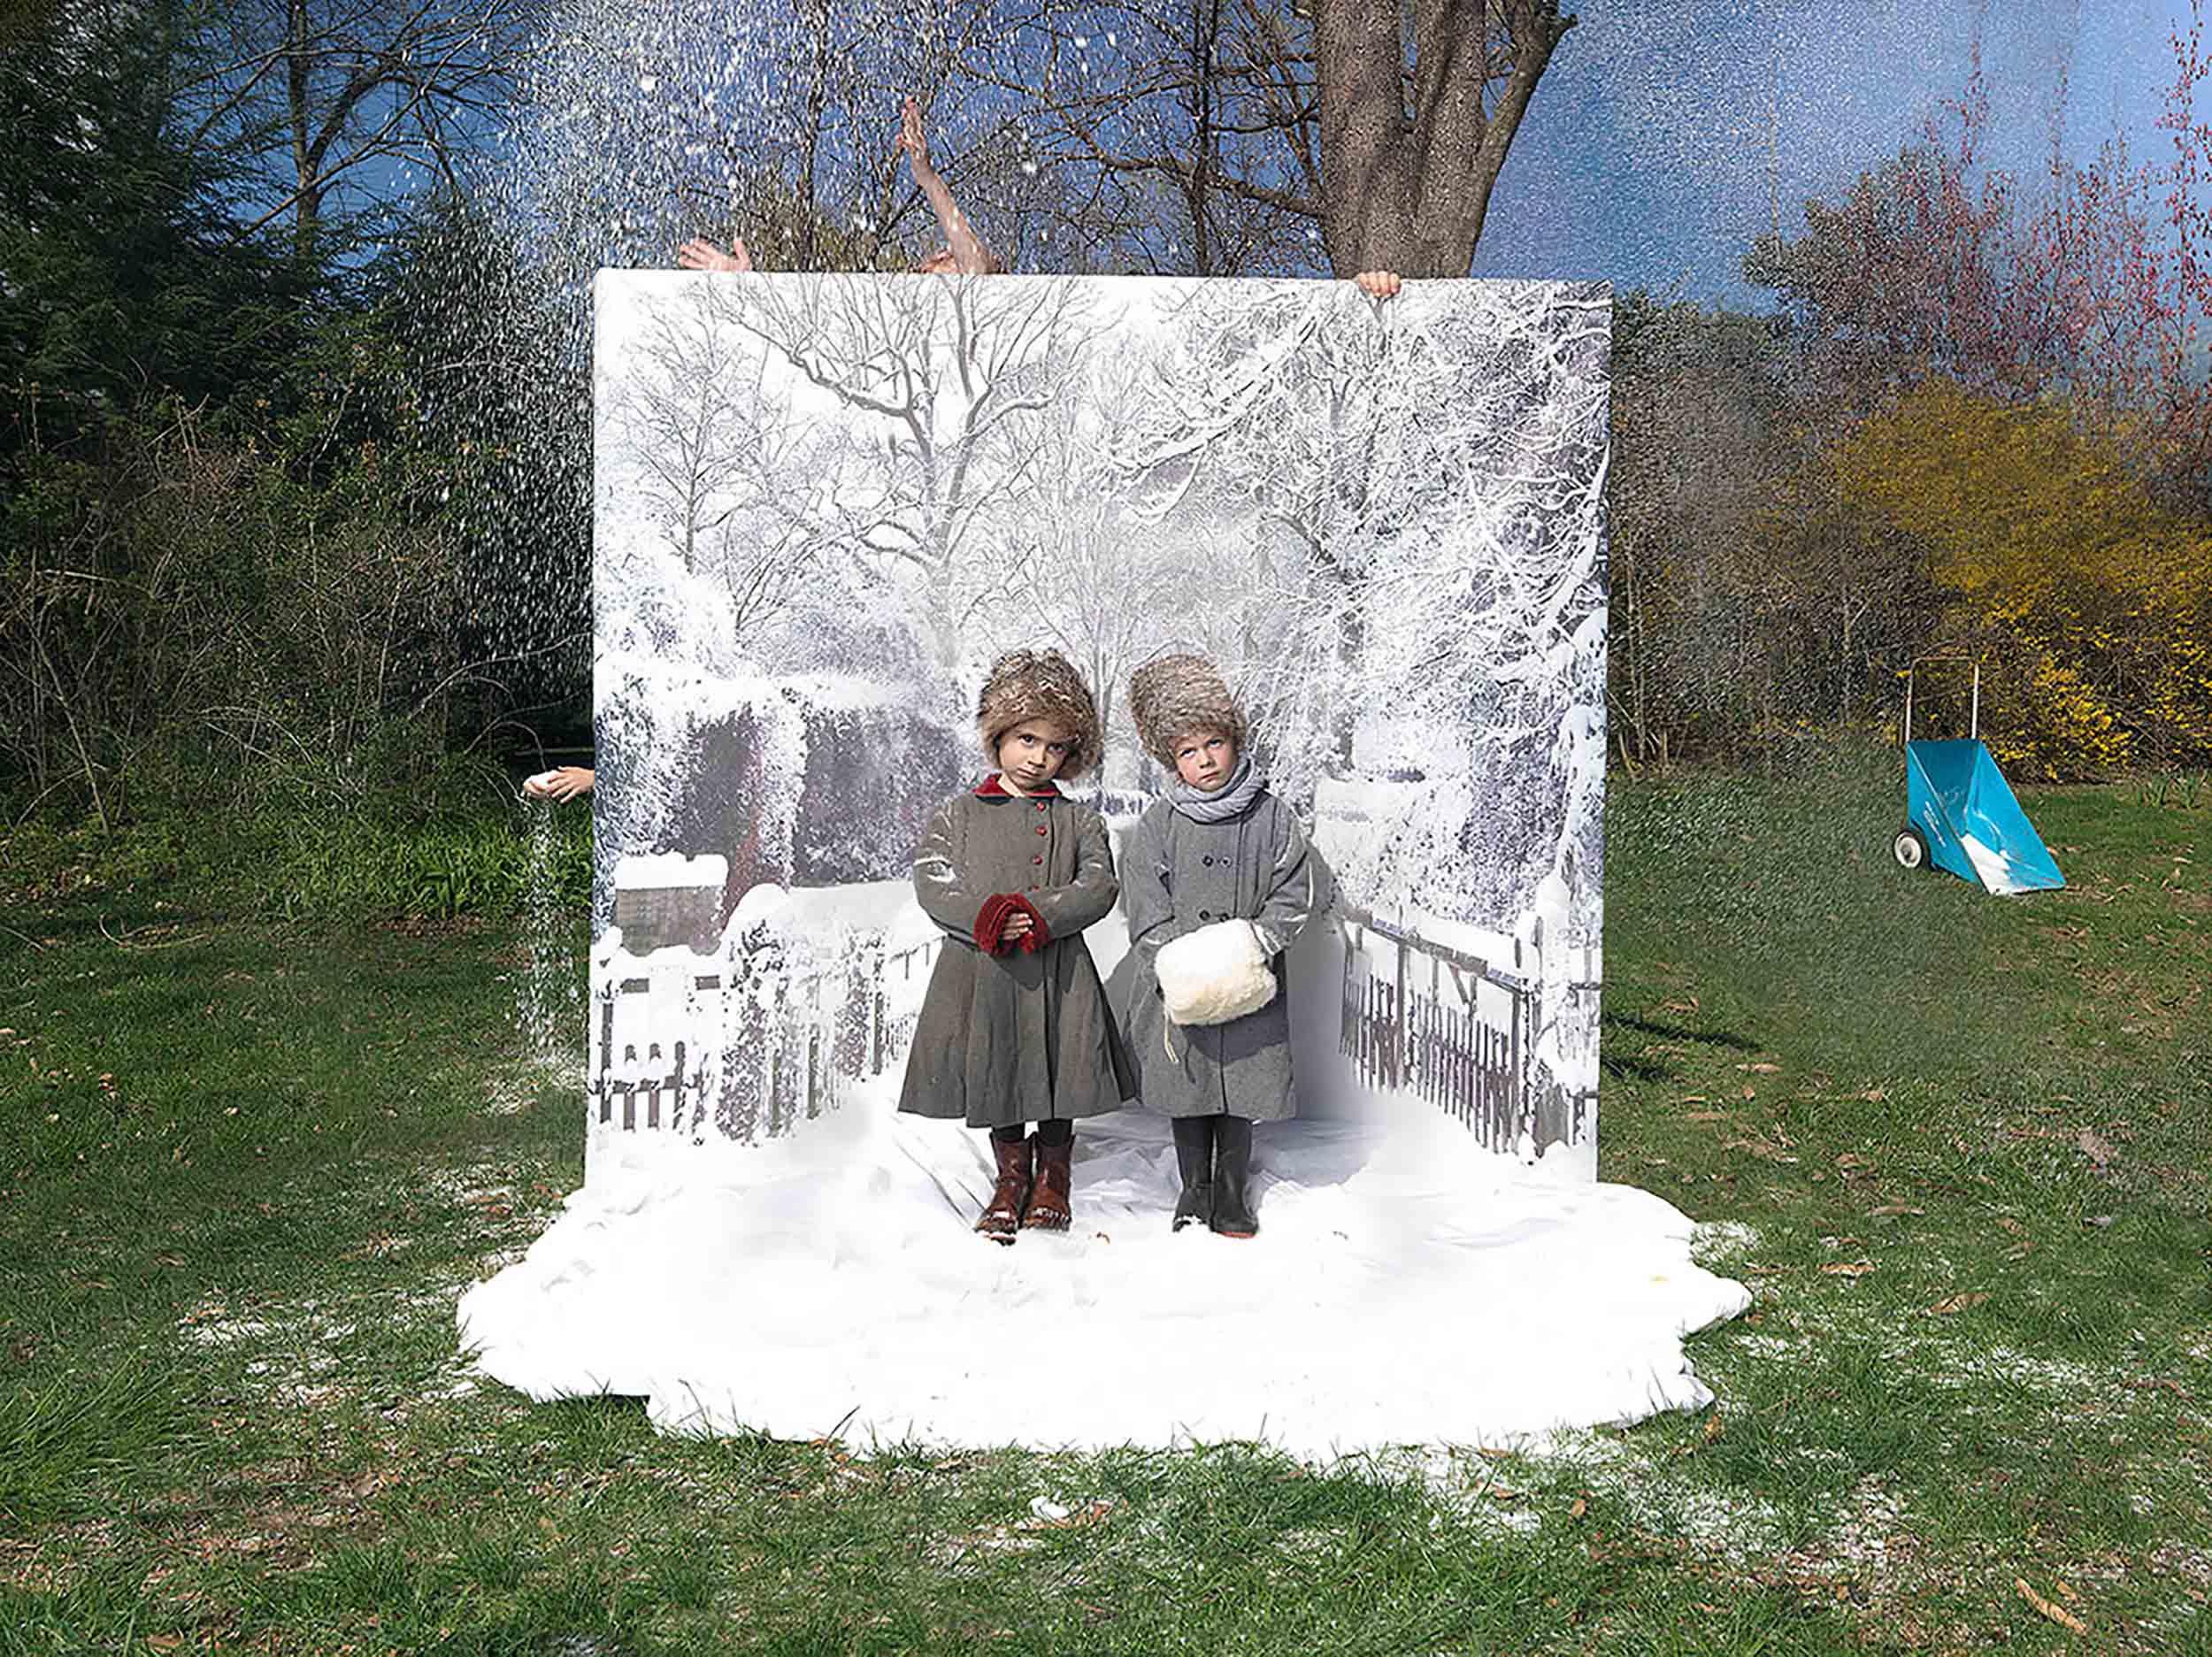 Julie Blackmon on her photo 'Fake Weather'